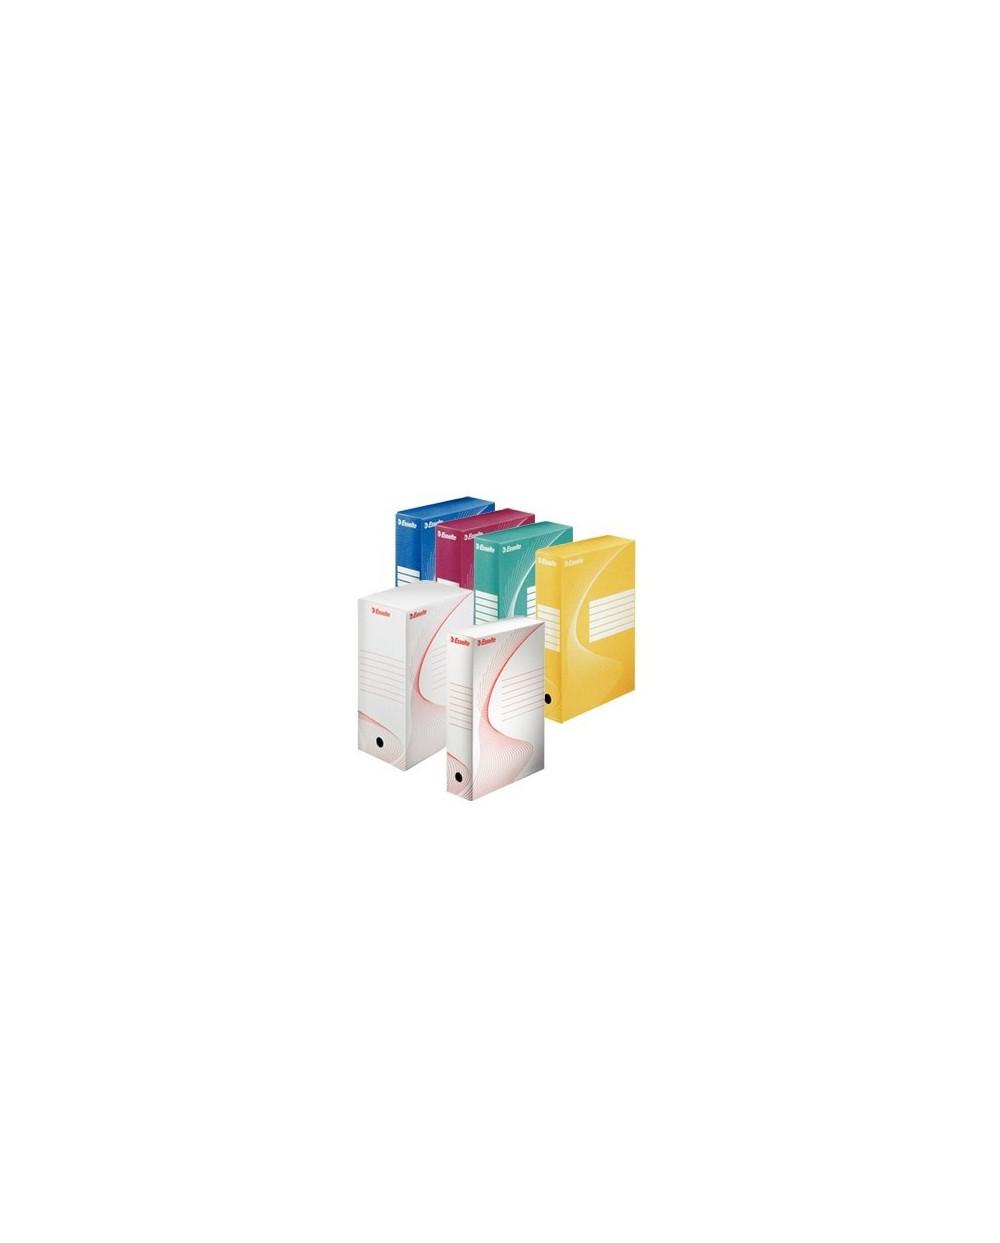 Архивна кутия Esselte бяла за контейнер - 150мм. гръб